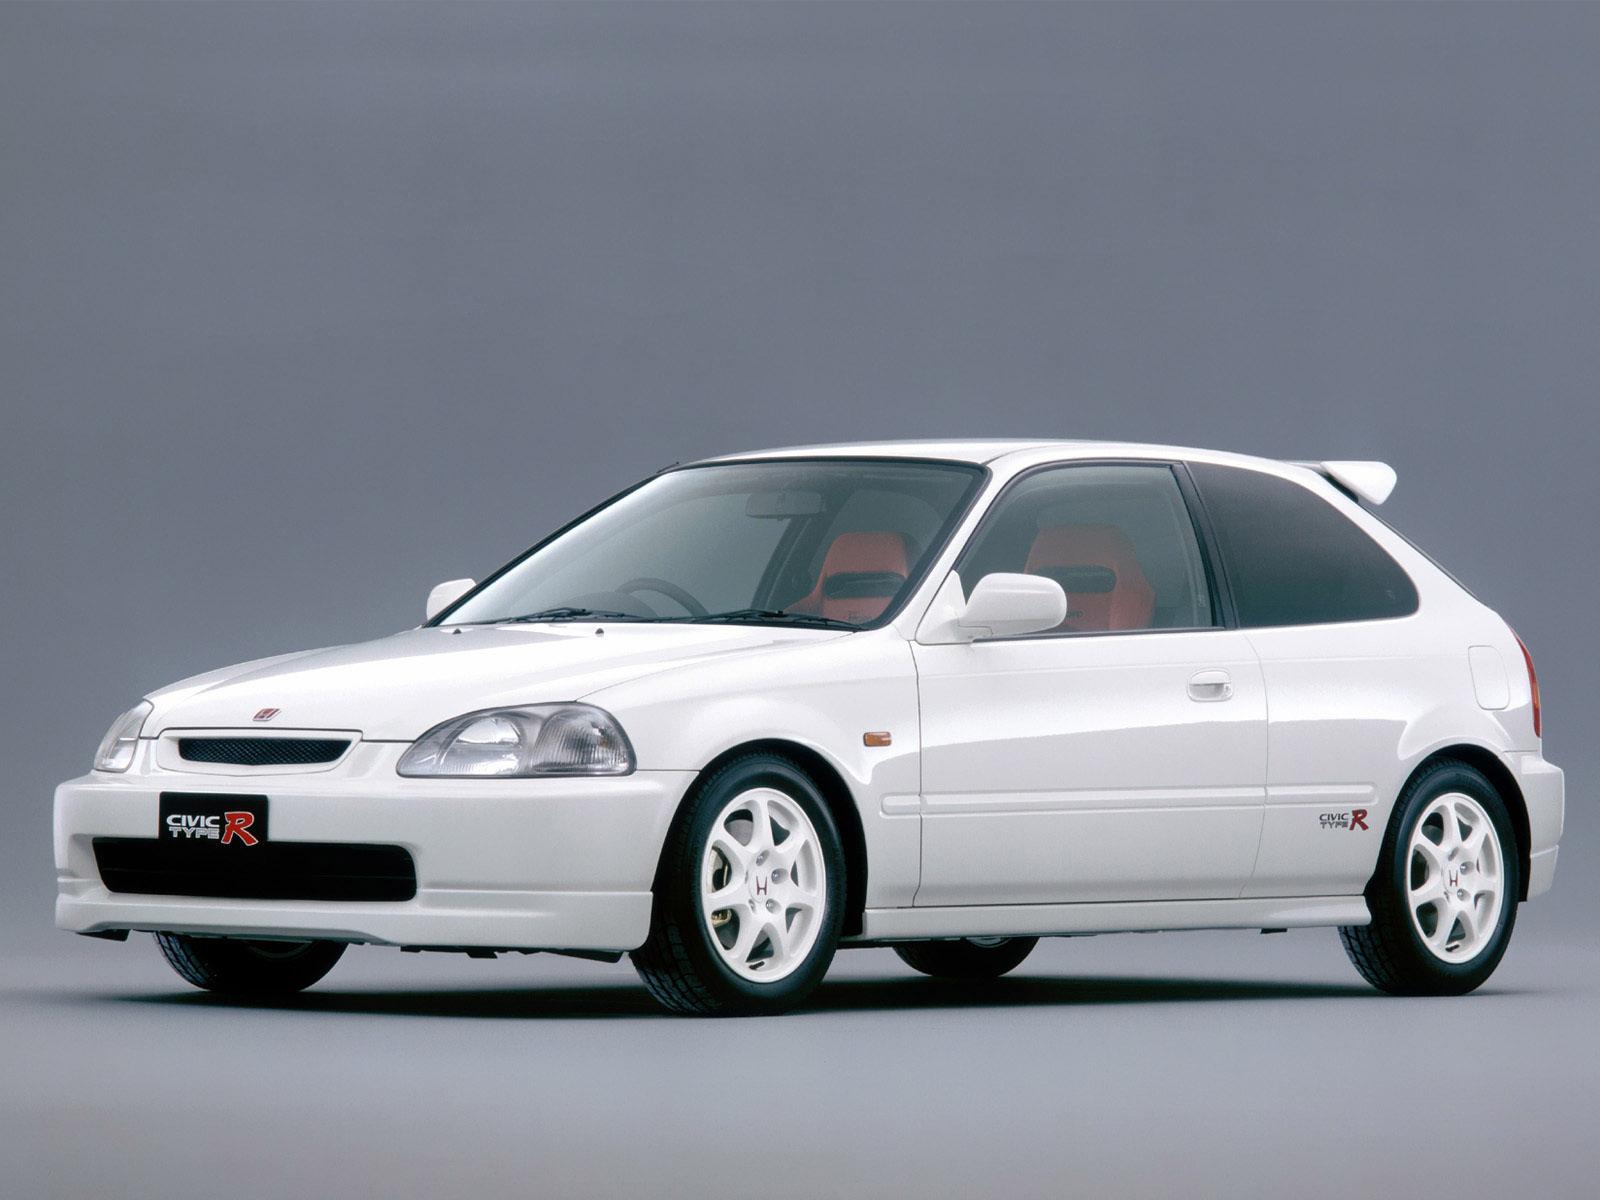 1997 Honda Civic Type-R #282412 - Best quality free high resolution